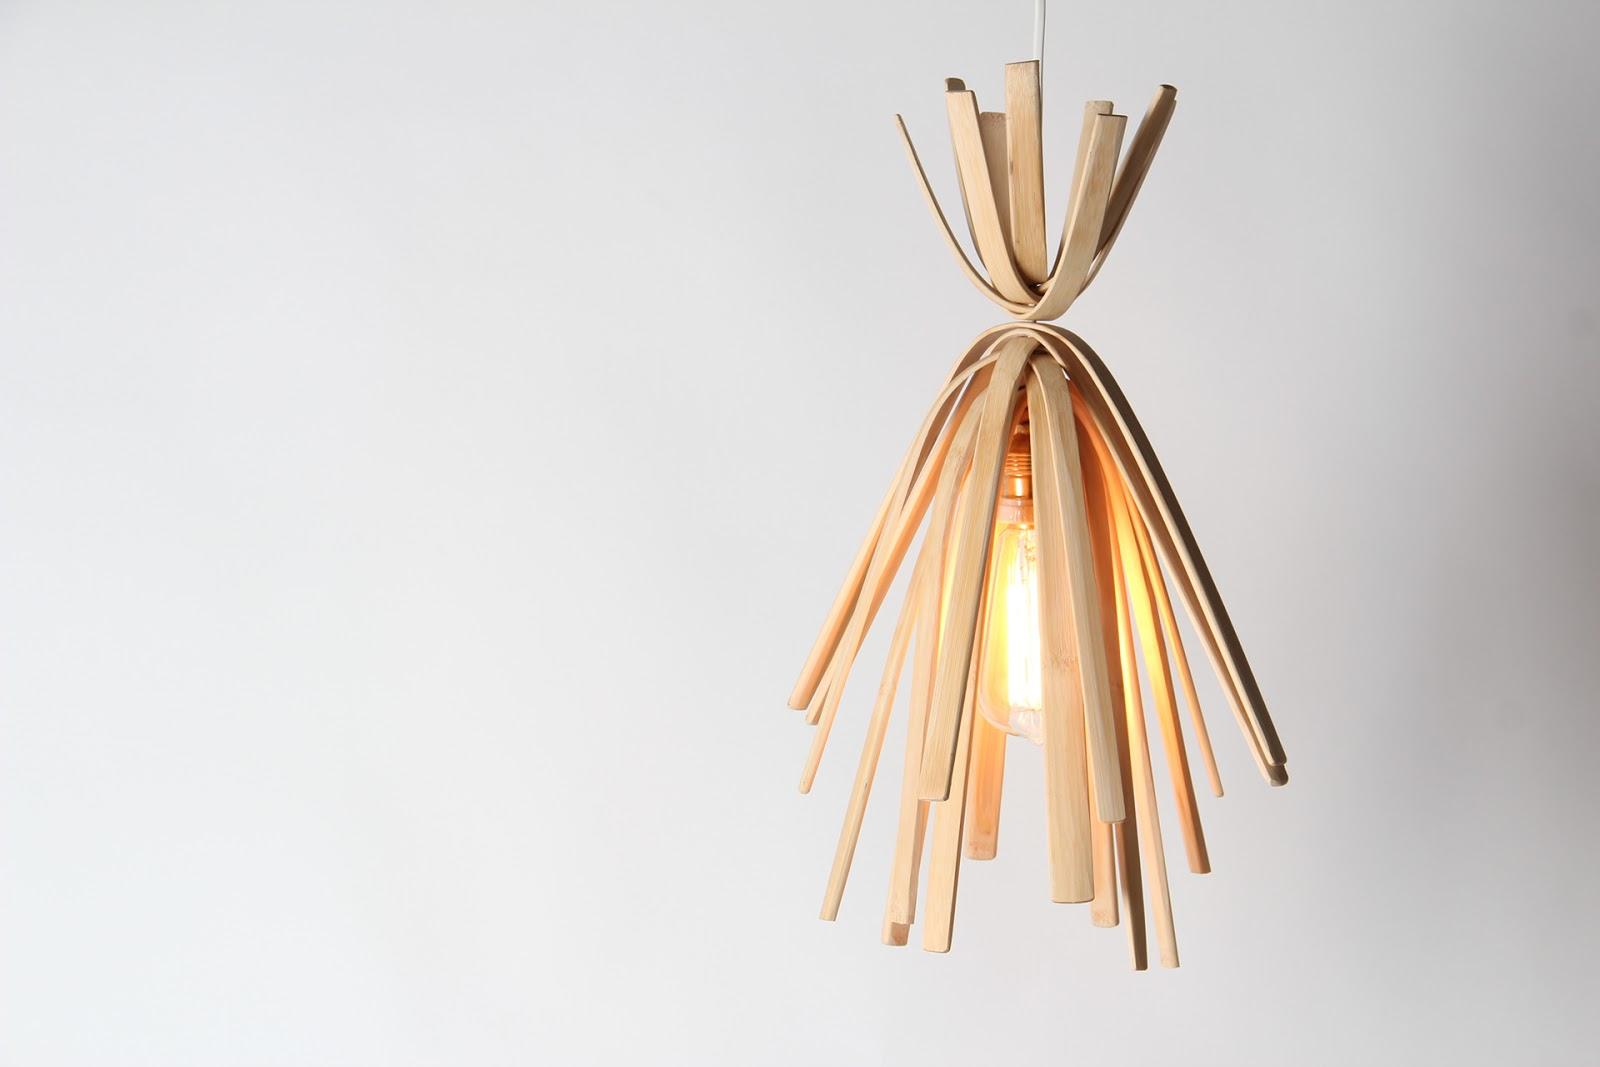 Lamp Design by Mauricio Sanin